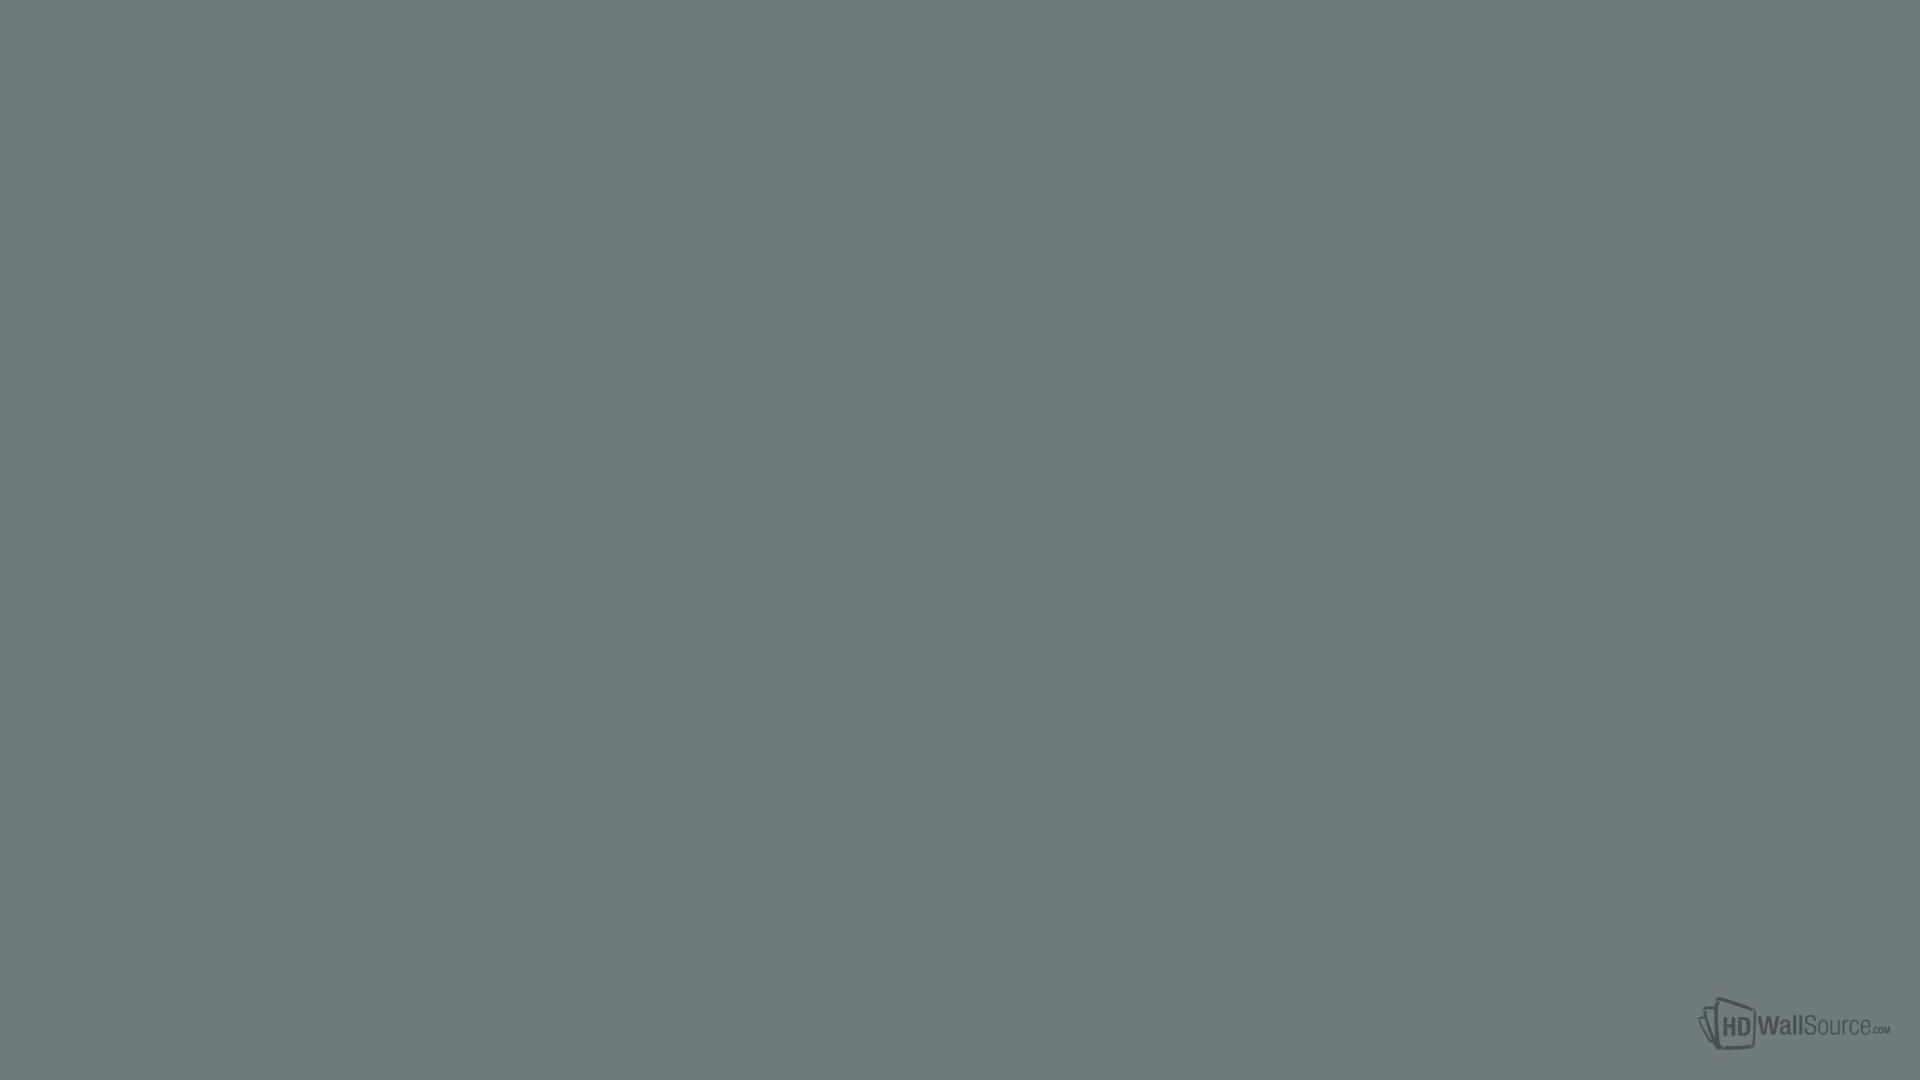 707b7c wallpaper 70950